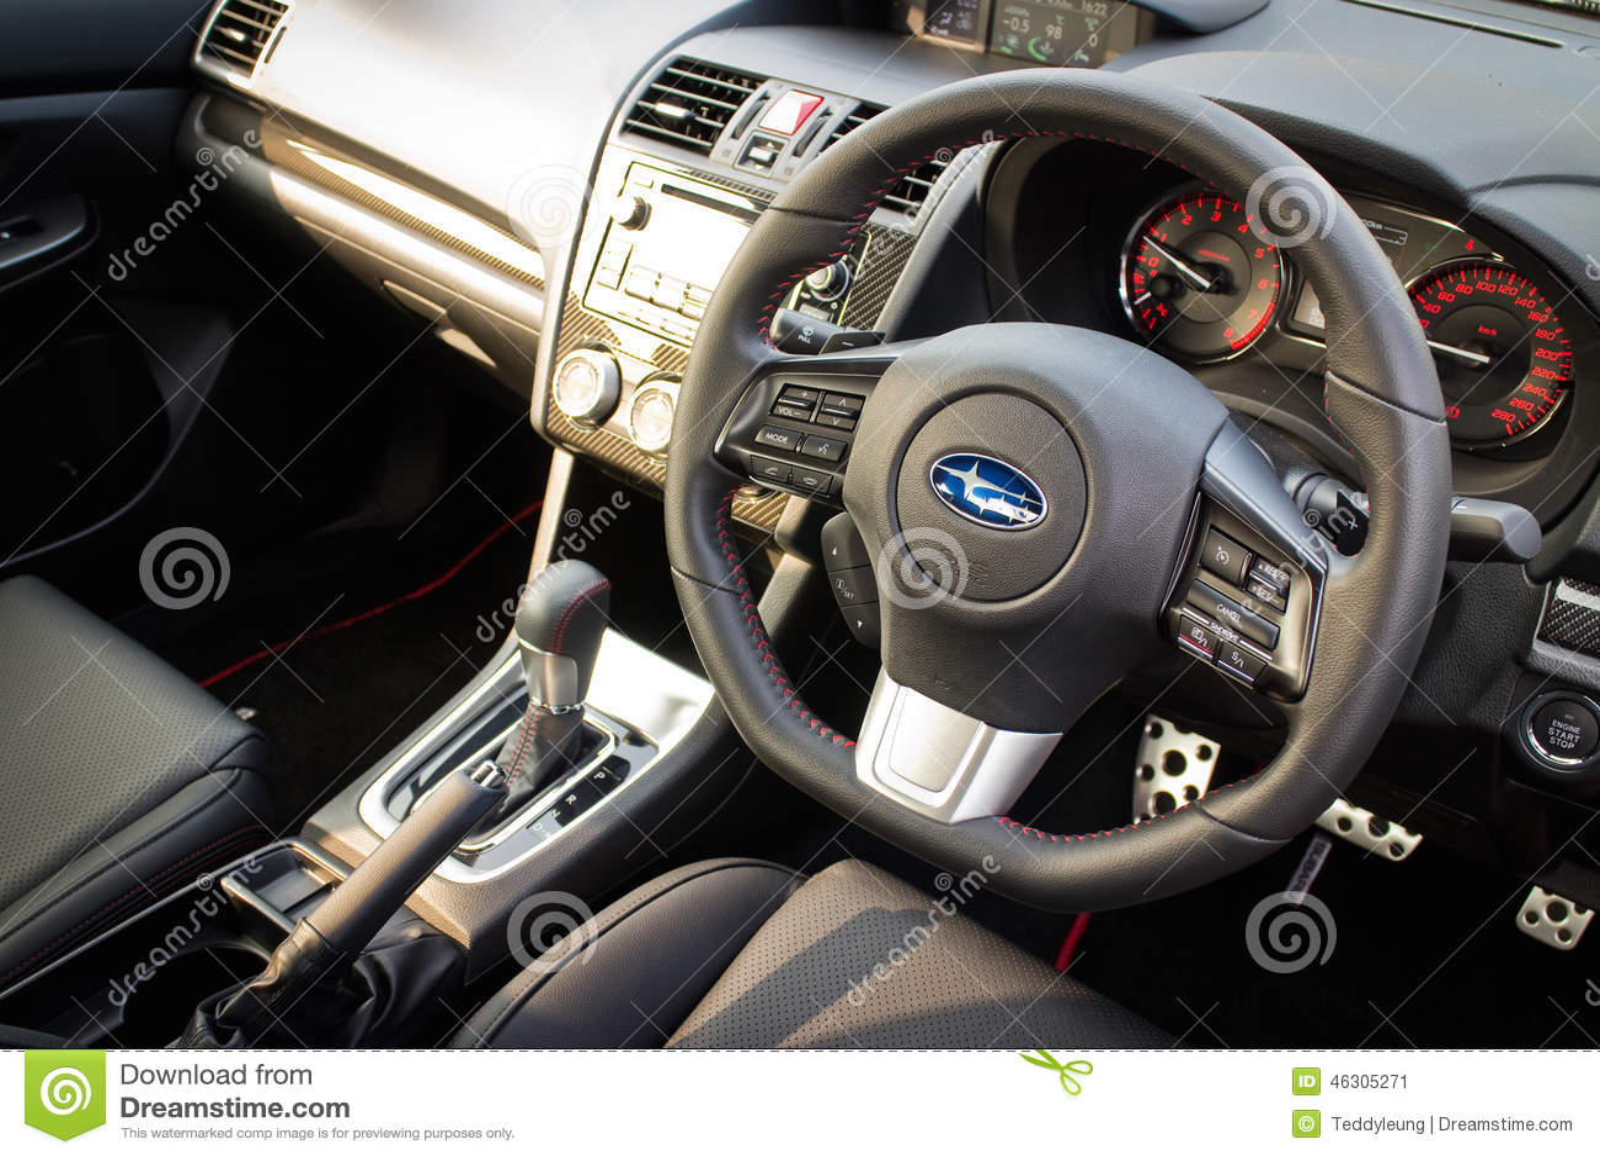 Subaru Wrx 2014 Interior Editorial Photo Image Of